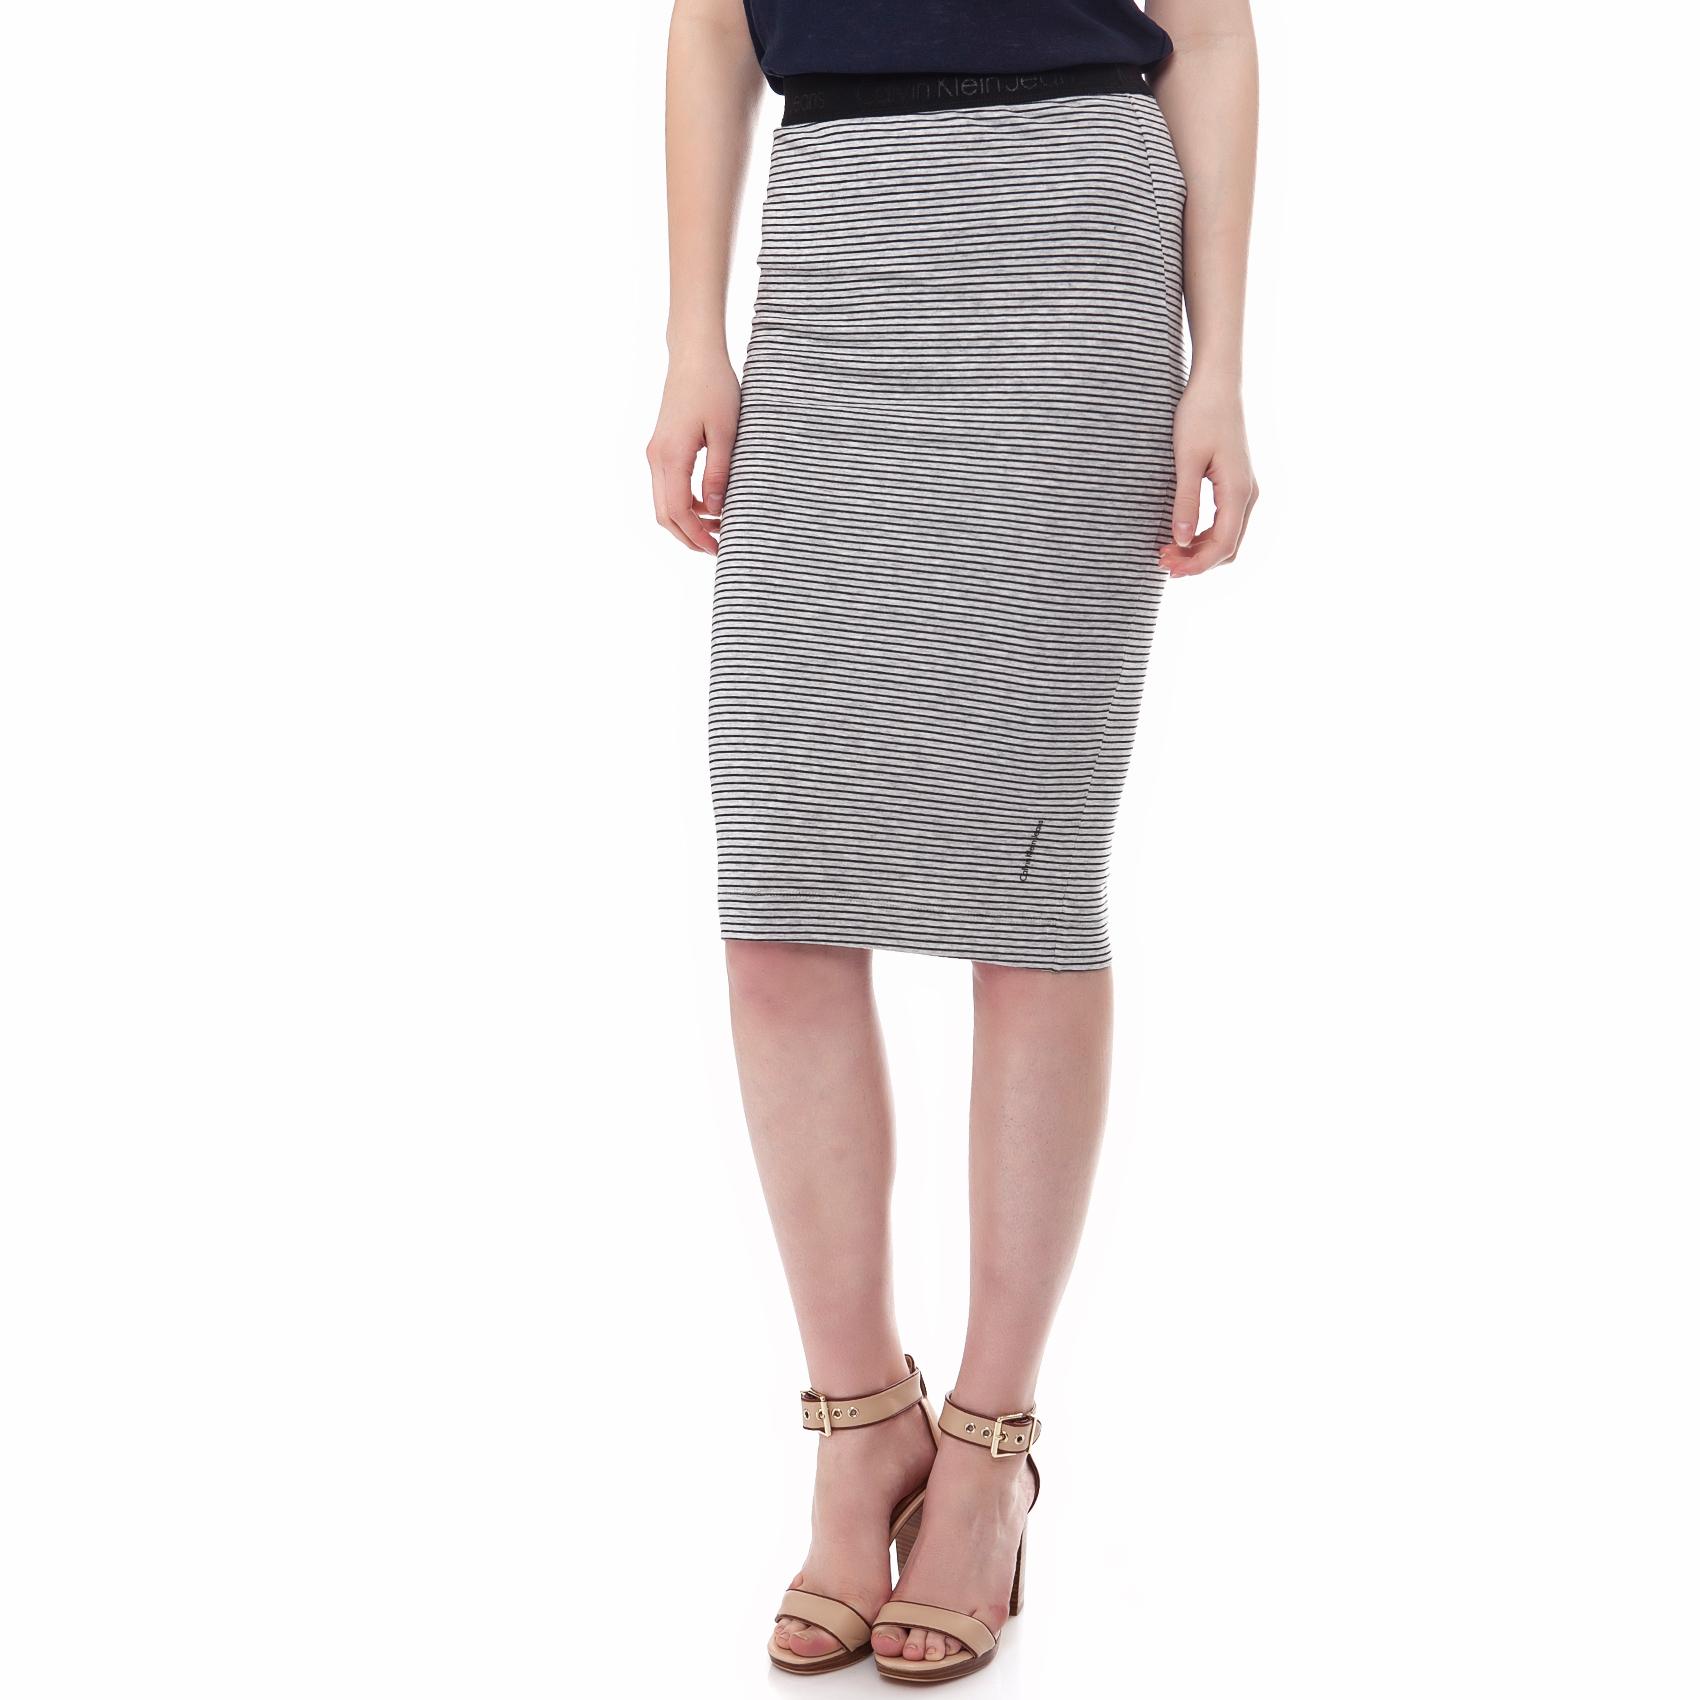 CALVIN KLEIN JEANS - Γυναικεία φούστα Calvin Klein Jeans γκρι-μαύρη γυναικεία ρούχα φούστες μέχρι το γόνατο